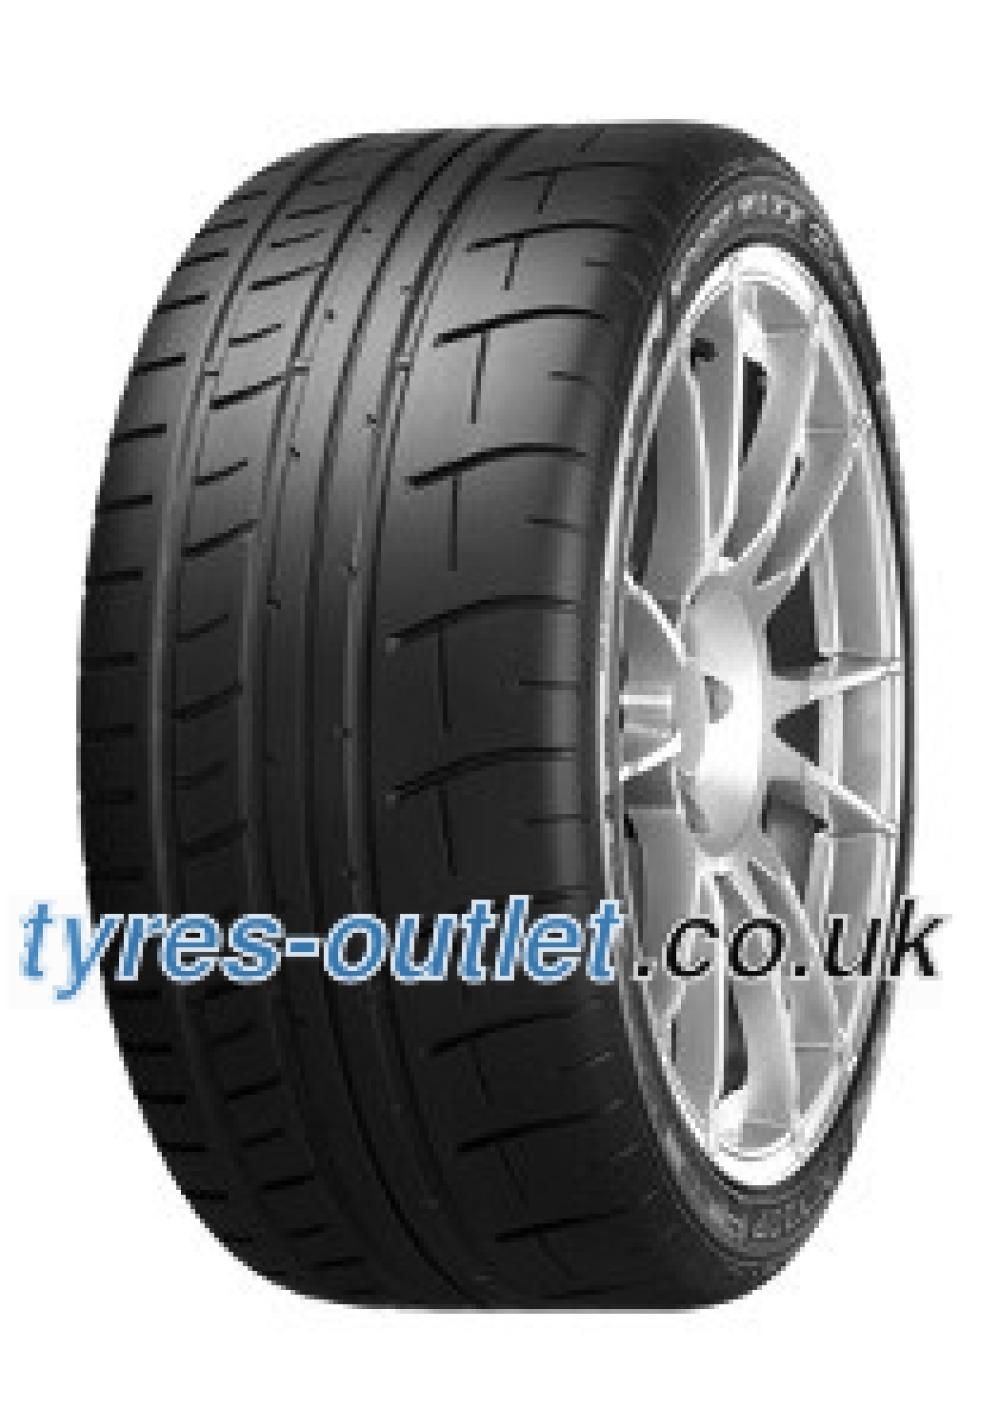 Dunlop Sport Maxx Race ( 305/30 ZR19 102Y XL with rim protection (MFS) )